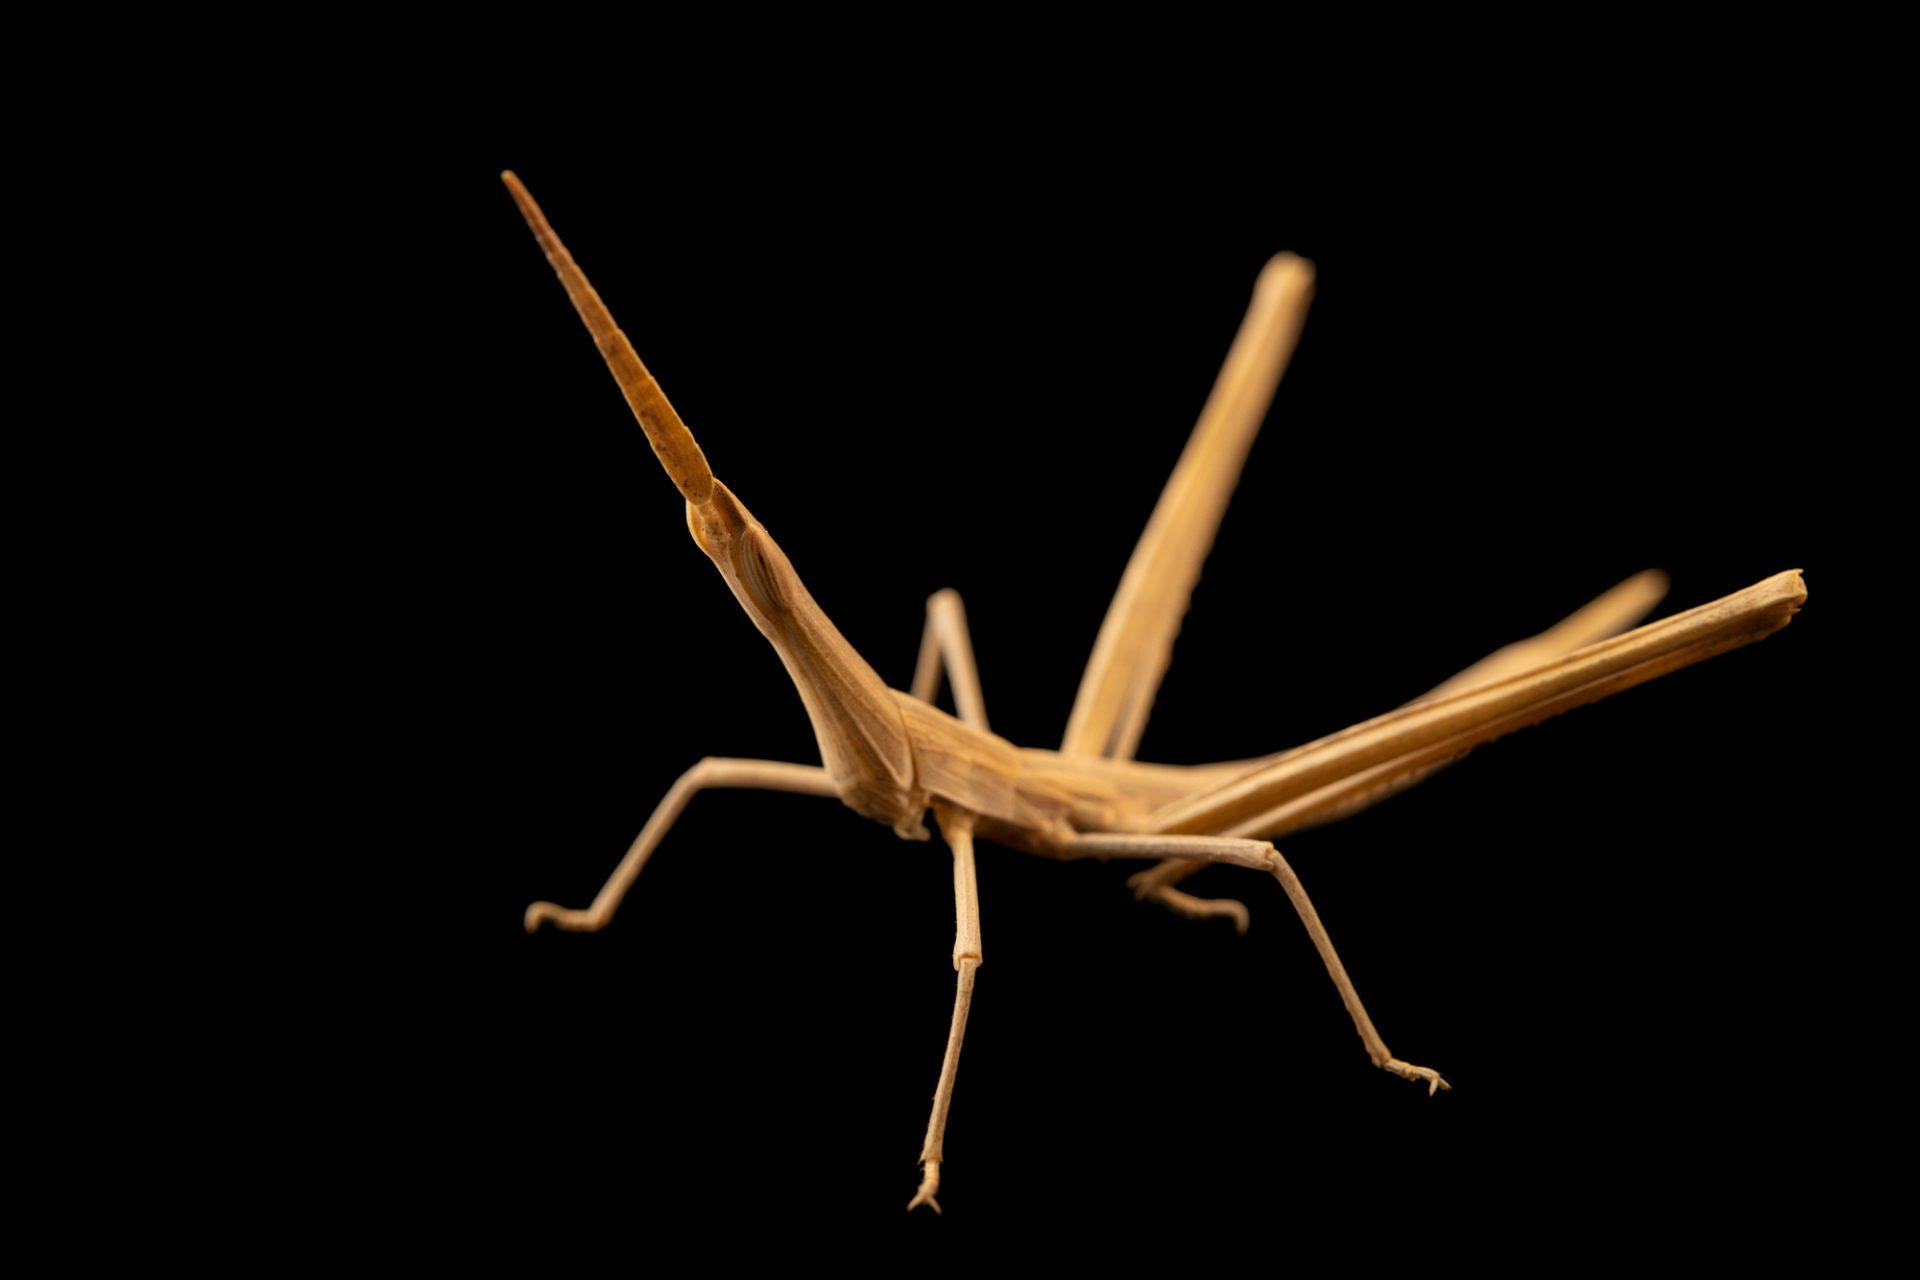 Photo: Grasshopper nymph (Acrida sp.) at Graham's Quinta dos Malvedos Vineyard.